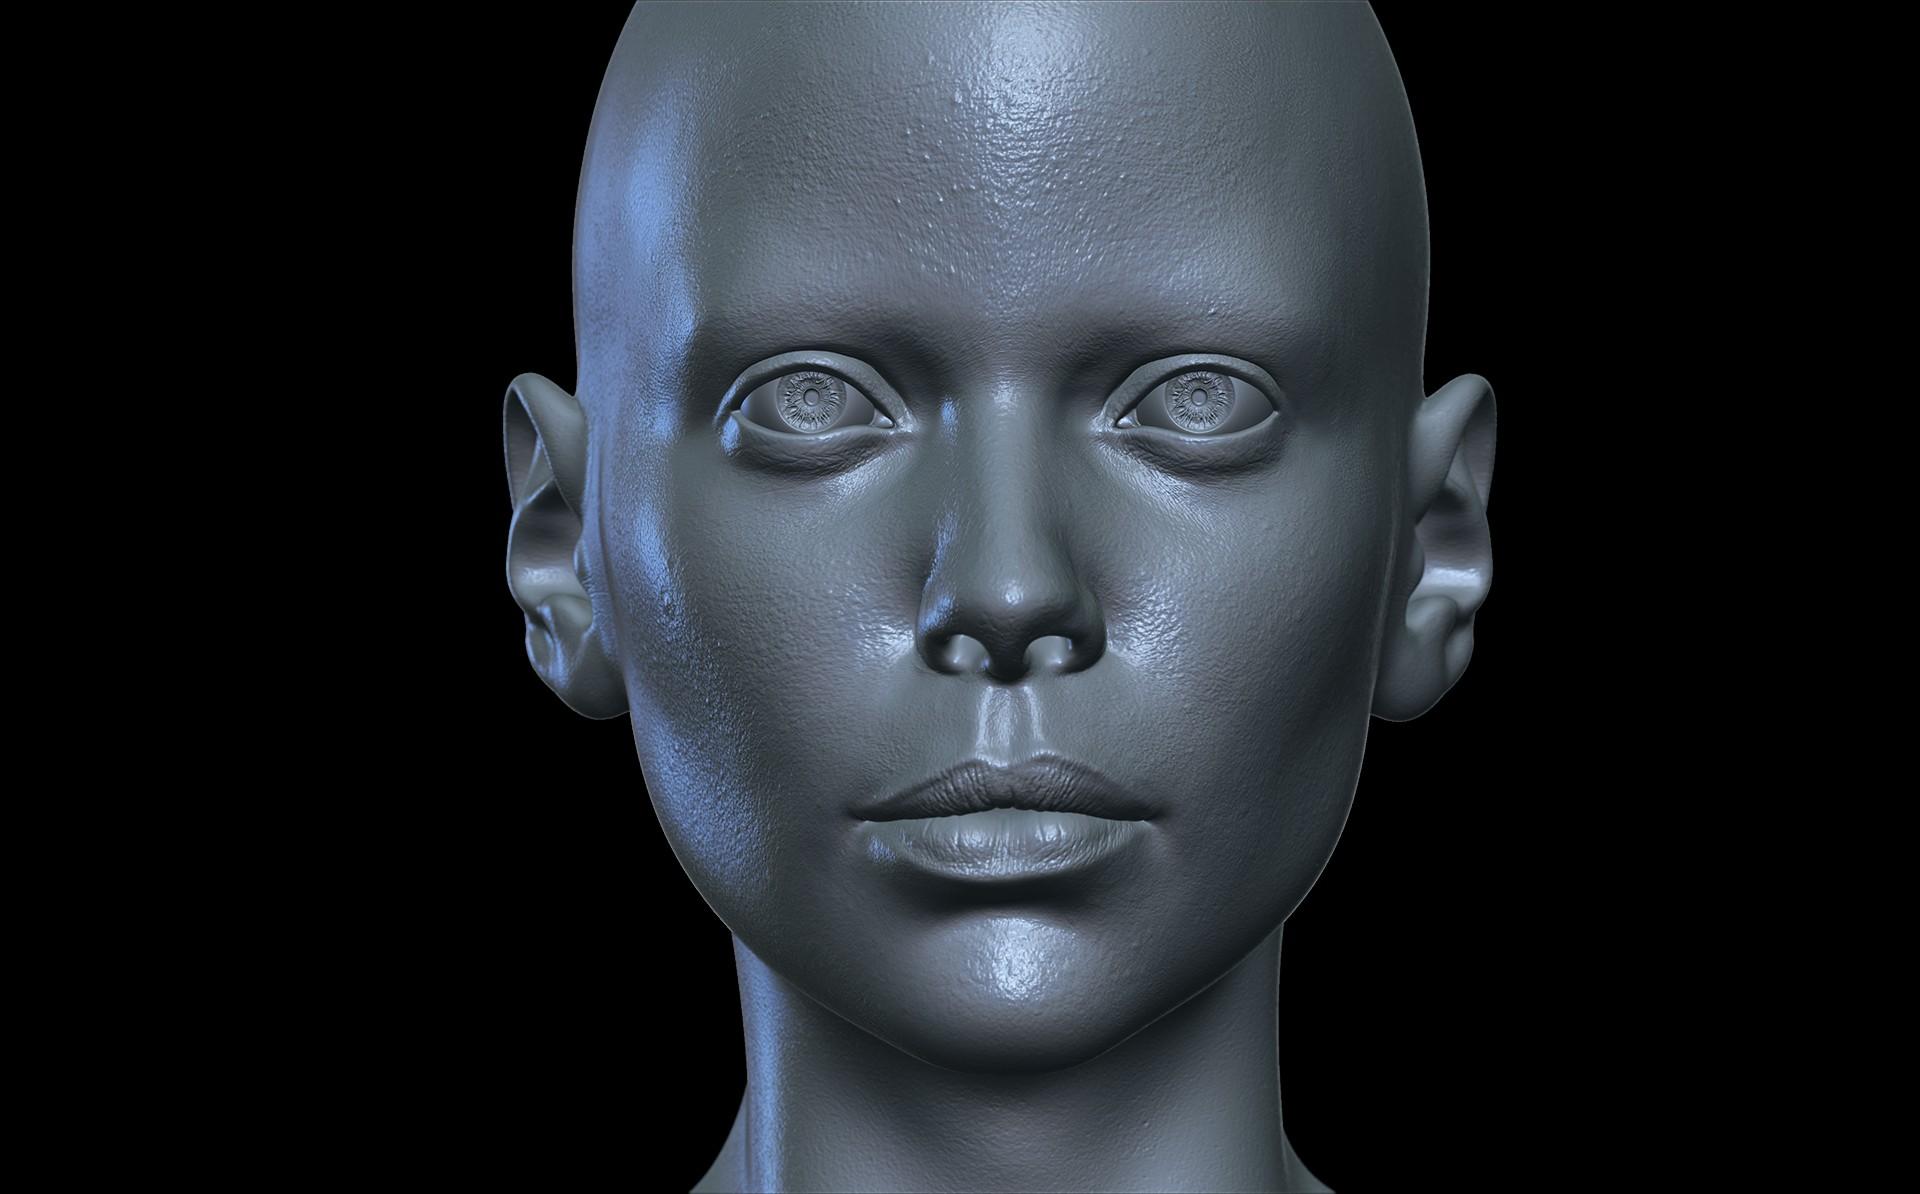 image masha-wip-facedetails.jpeg